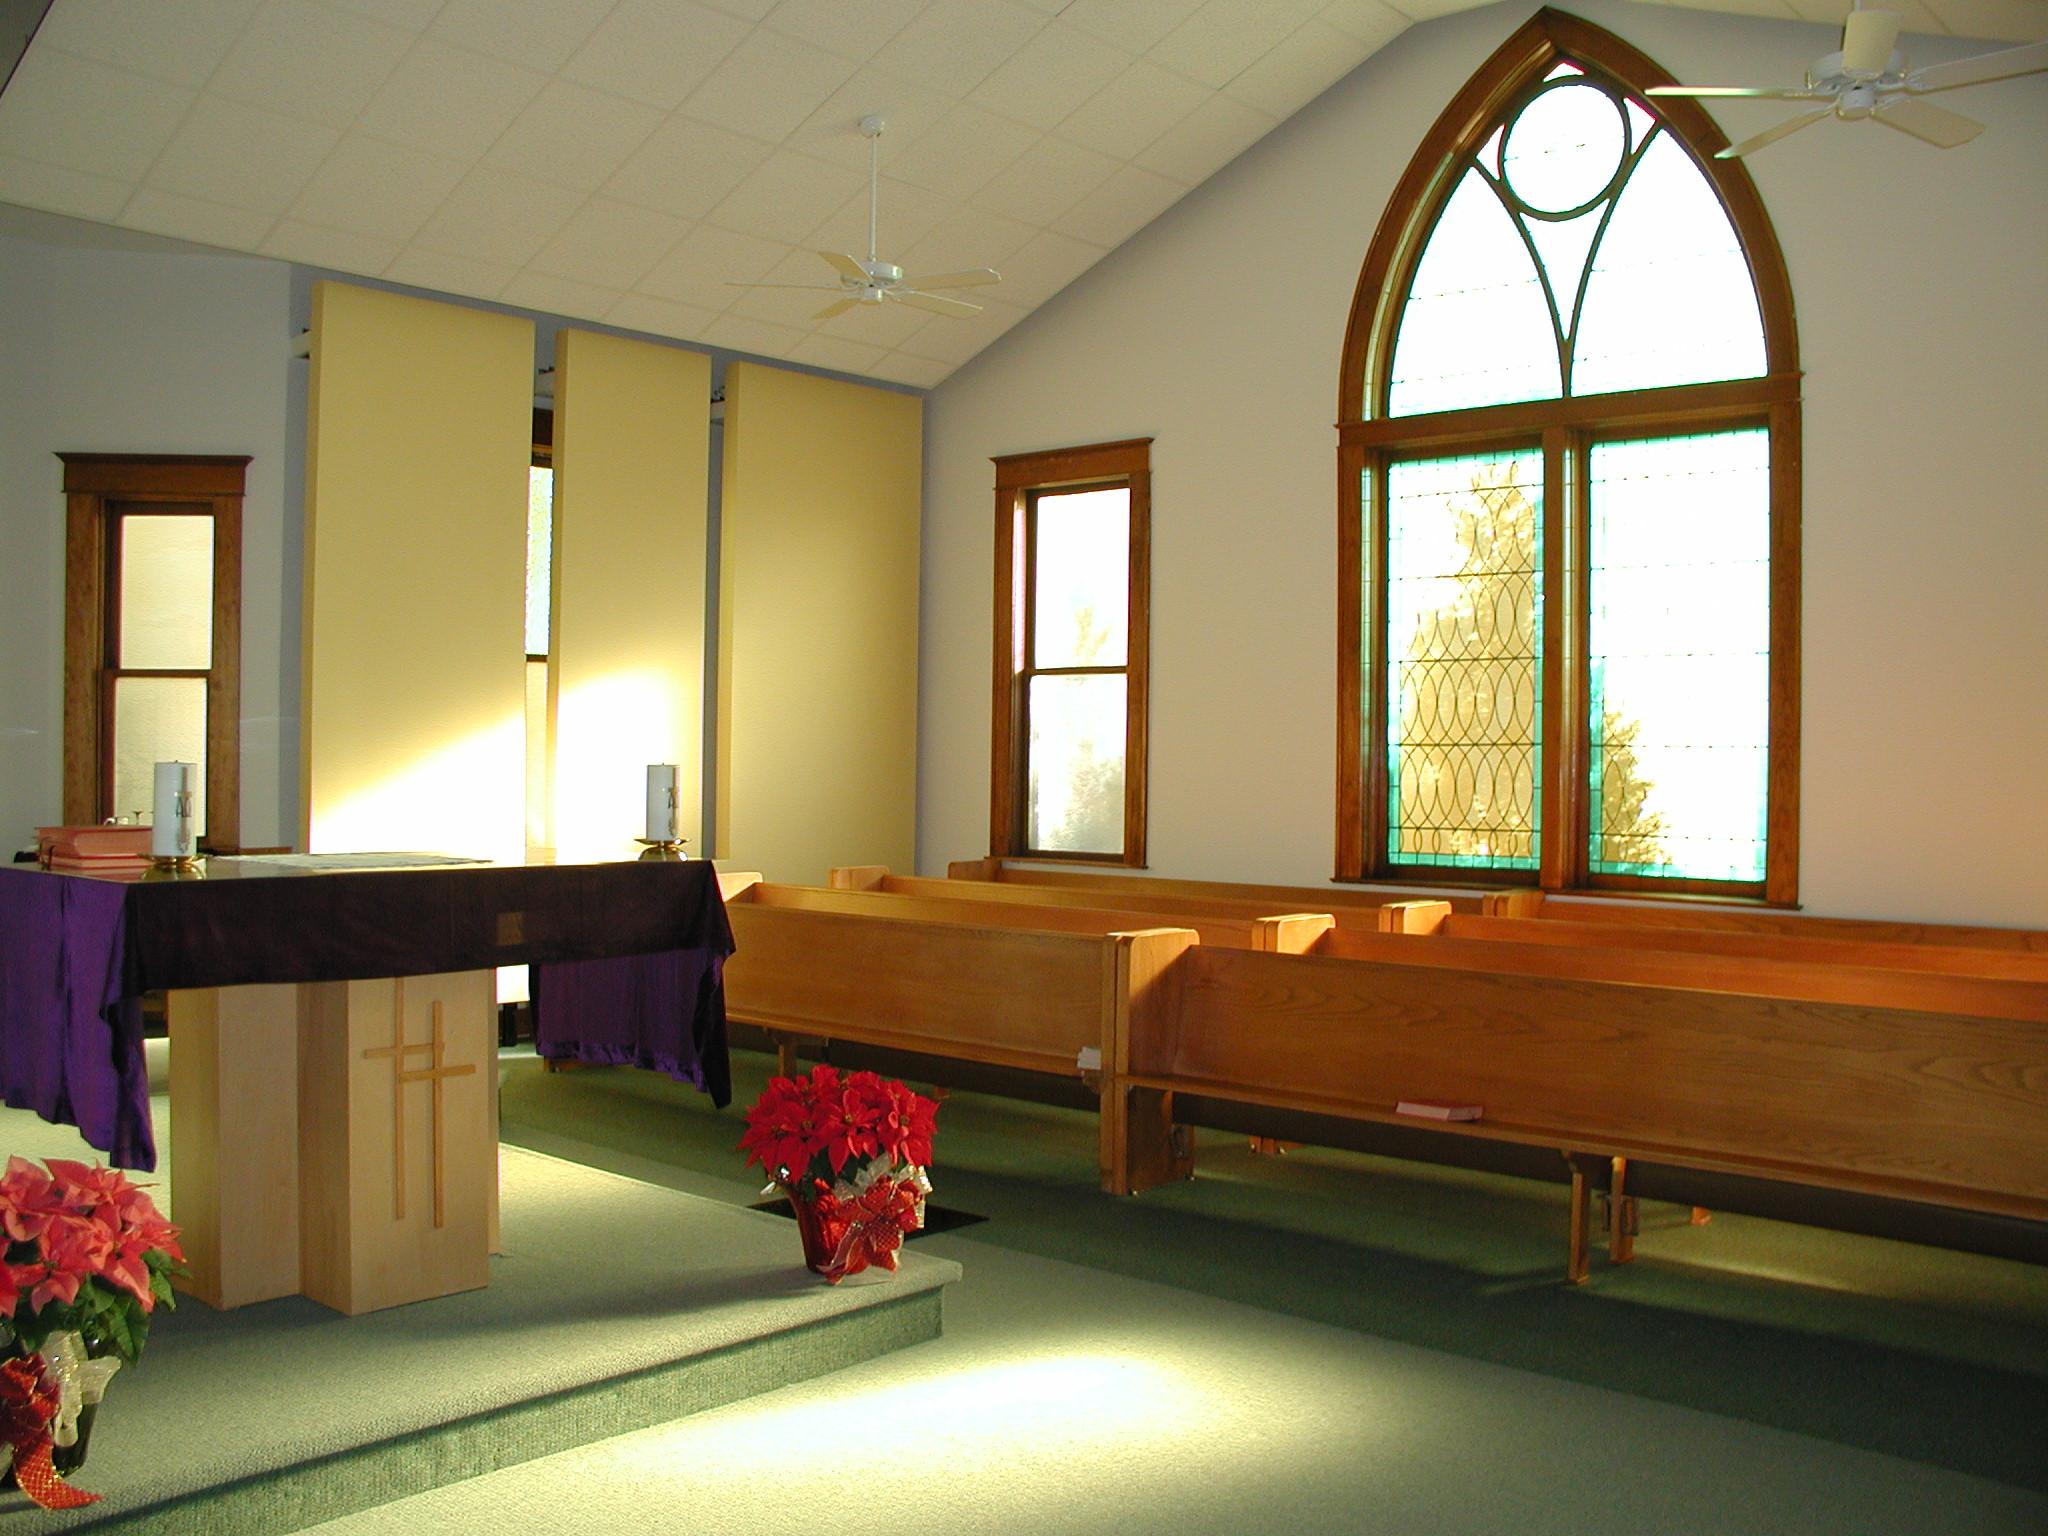 Johnstown Church